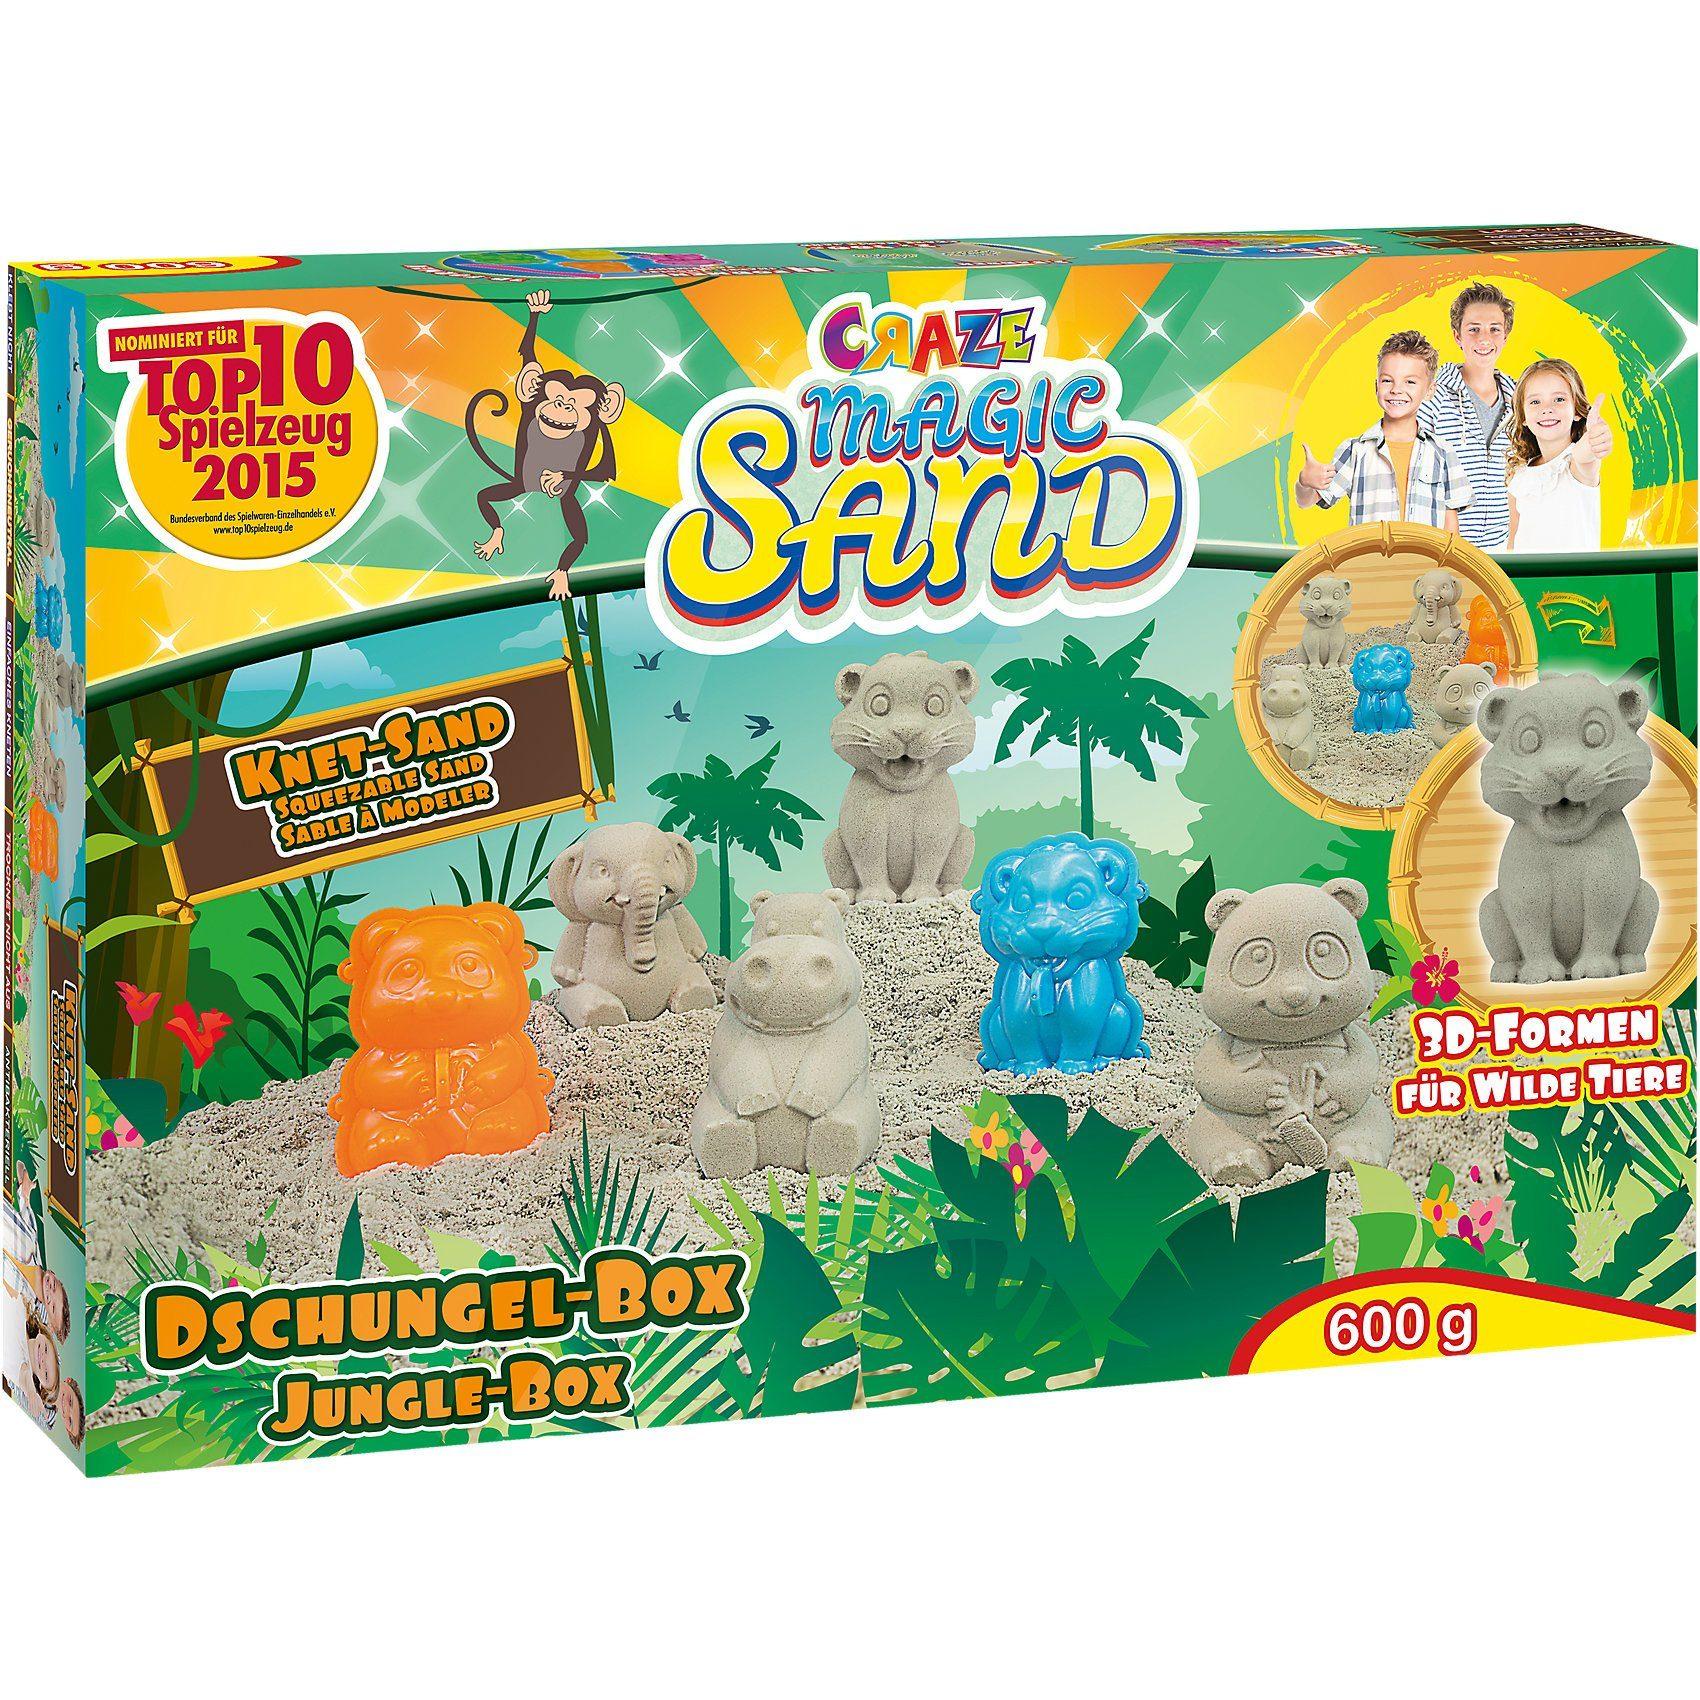 CRAZE Magic Sand Dschungel-Box